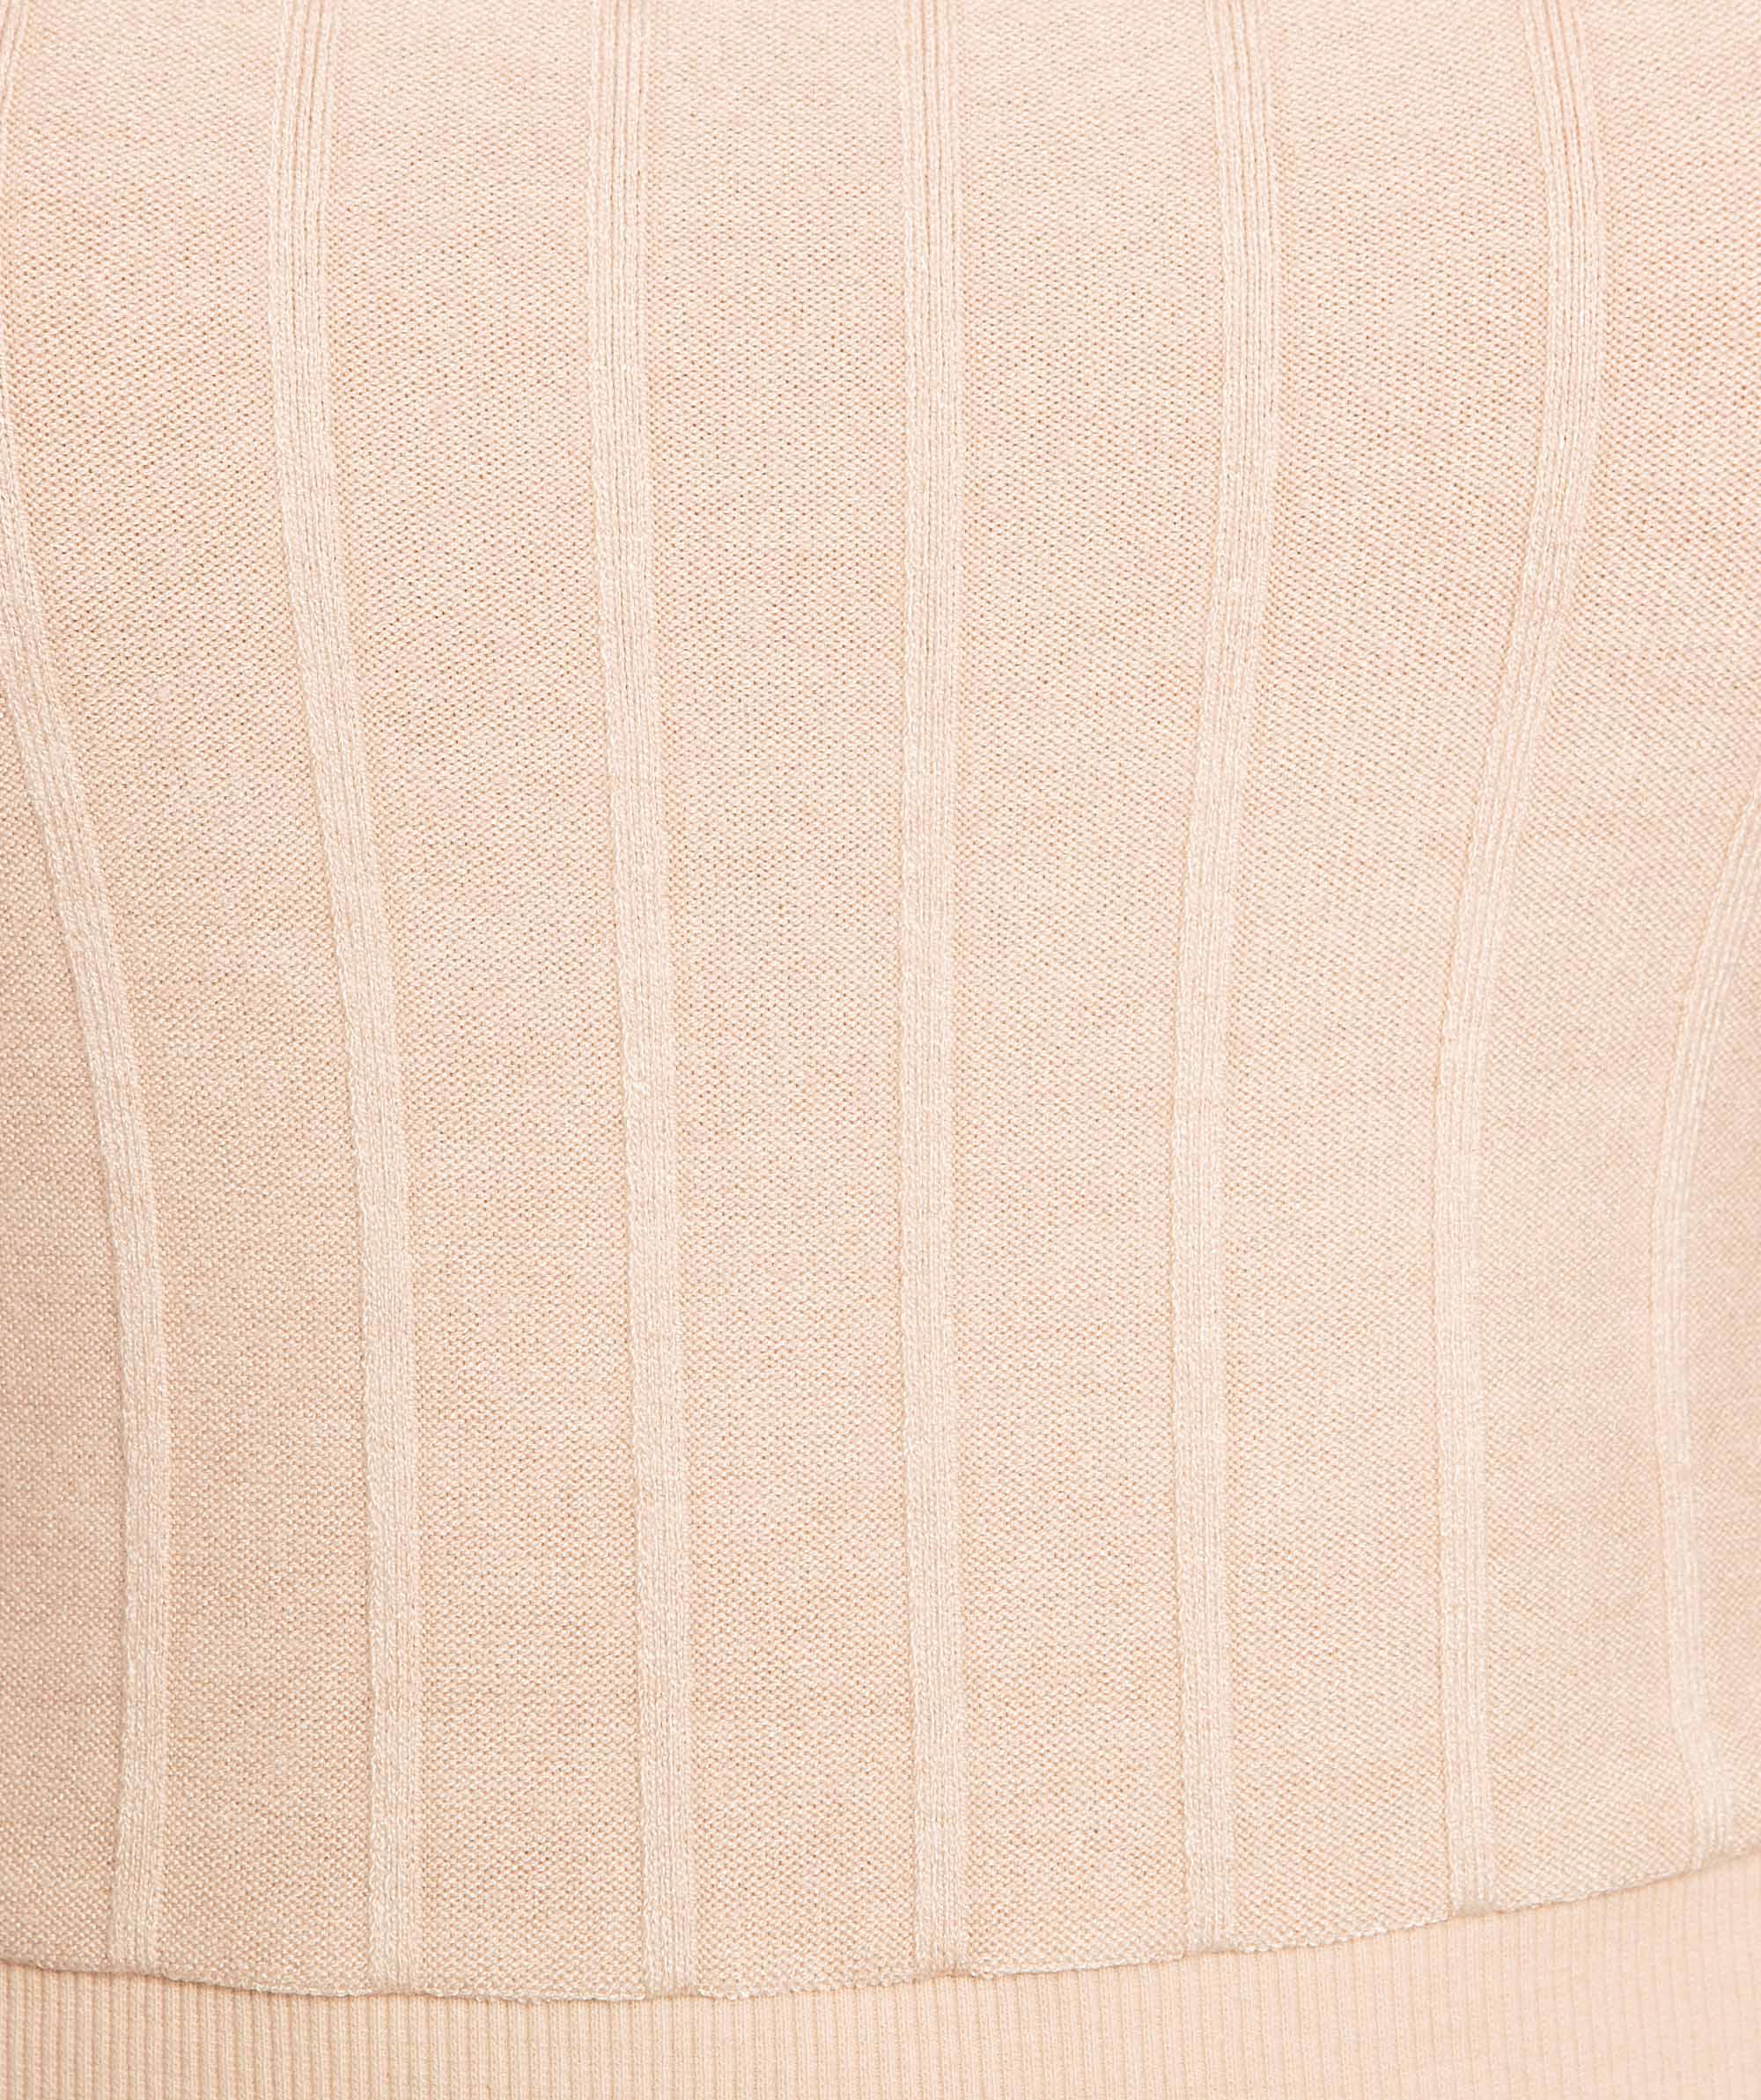 Harper Ruched Shorts - Oatmeal